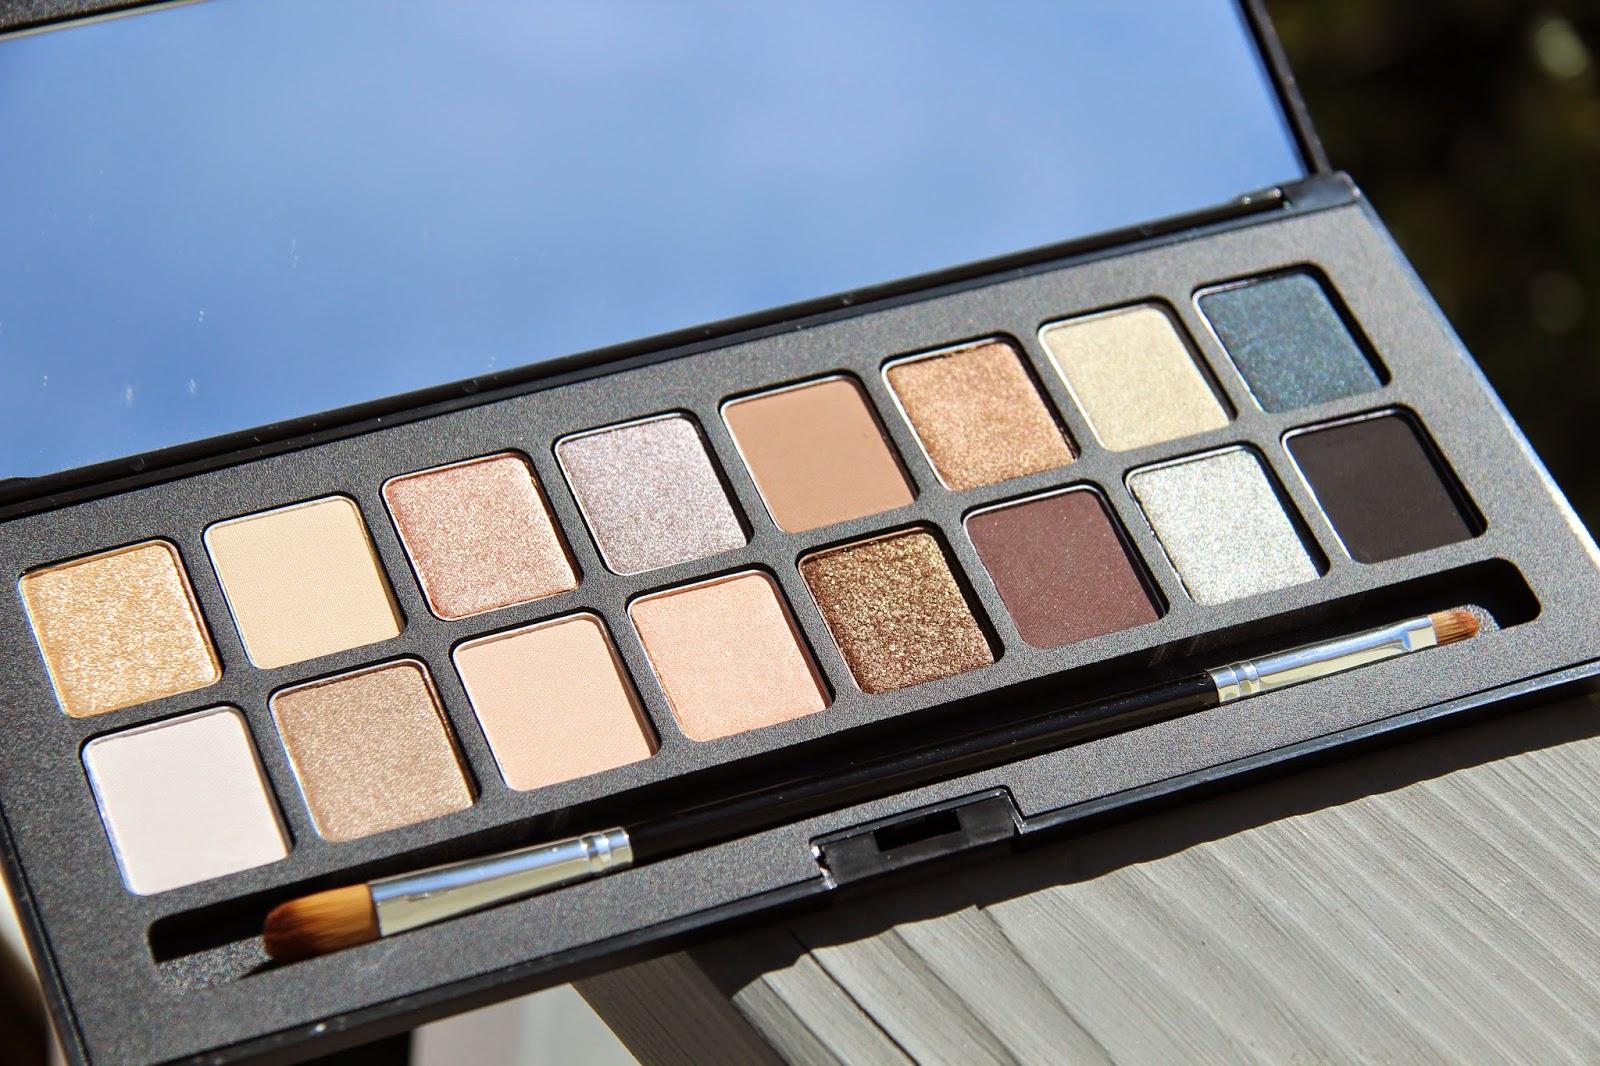 beauty squared: Shu Uemura Shu:Palette 16 Shades of Nude